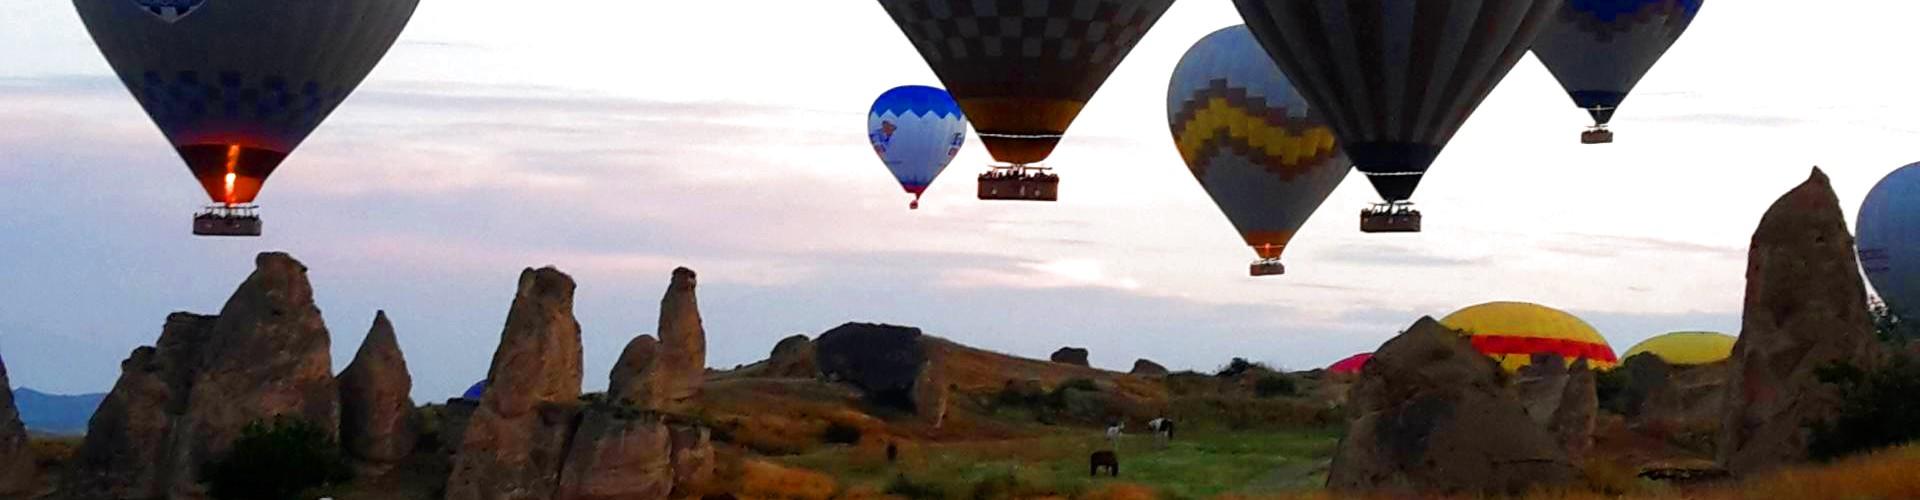 Im Kappadokien Urlaub märchenhafte Landschaften hautnah genießen